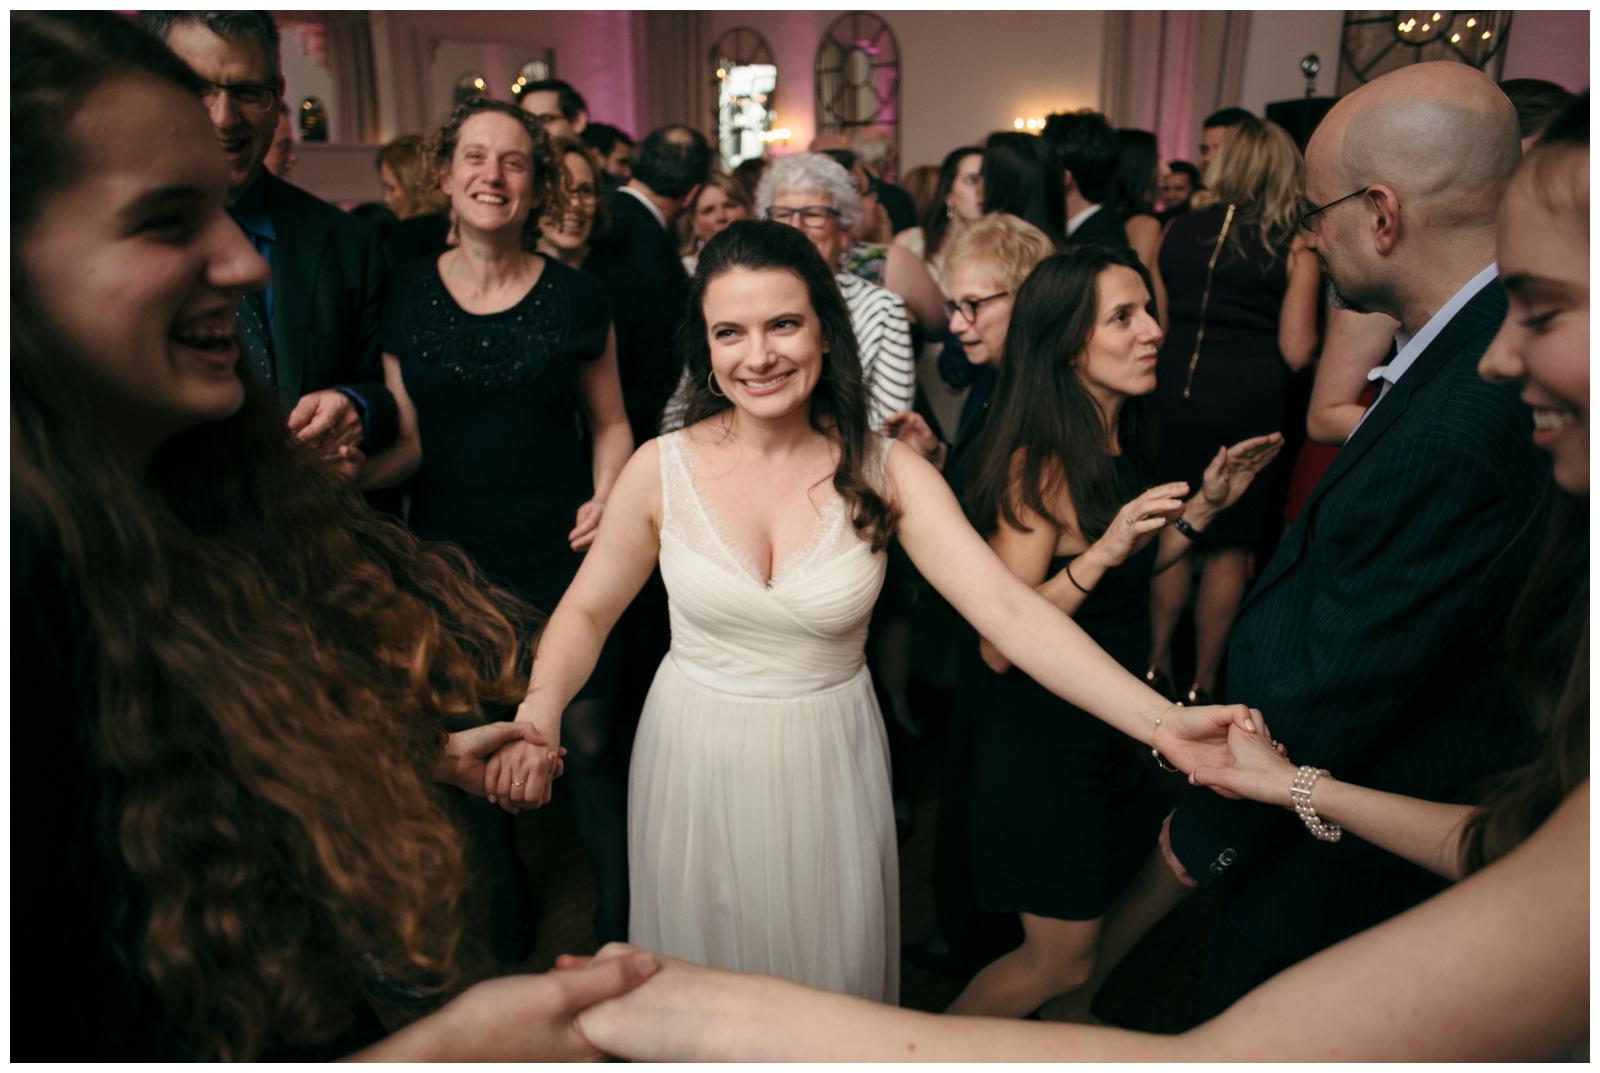 Alden-Castle-Wedding-Boston-Bailey-Q-Photo-066.jpg